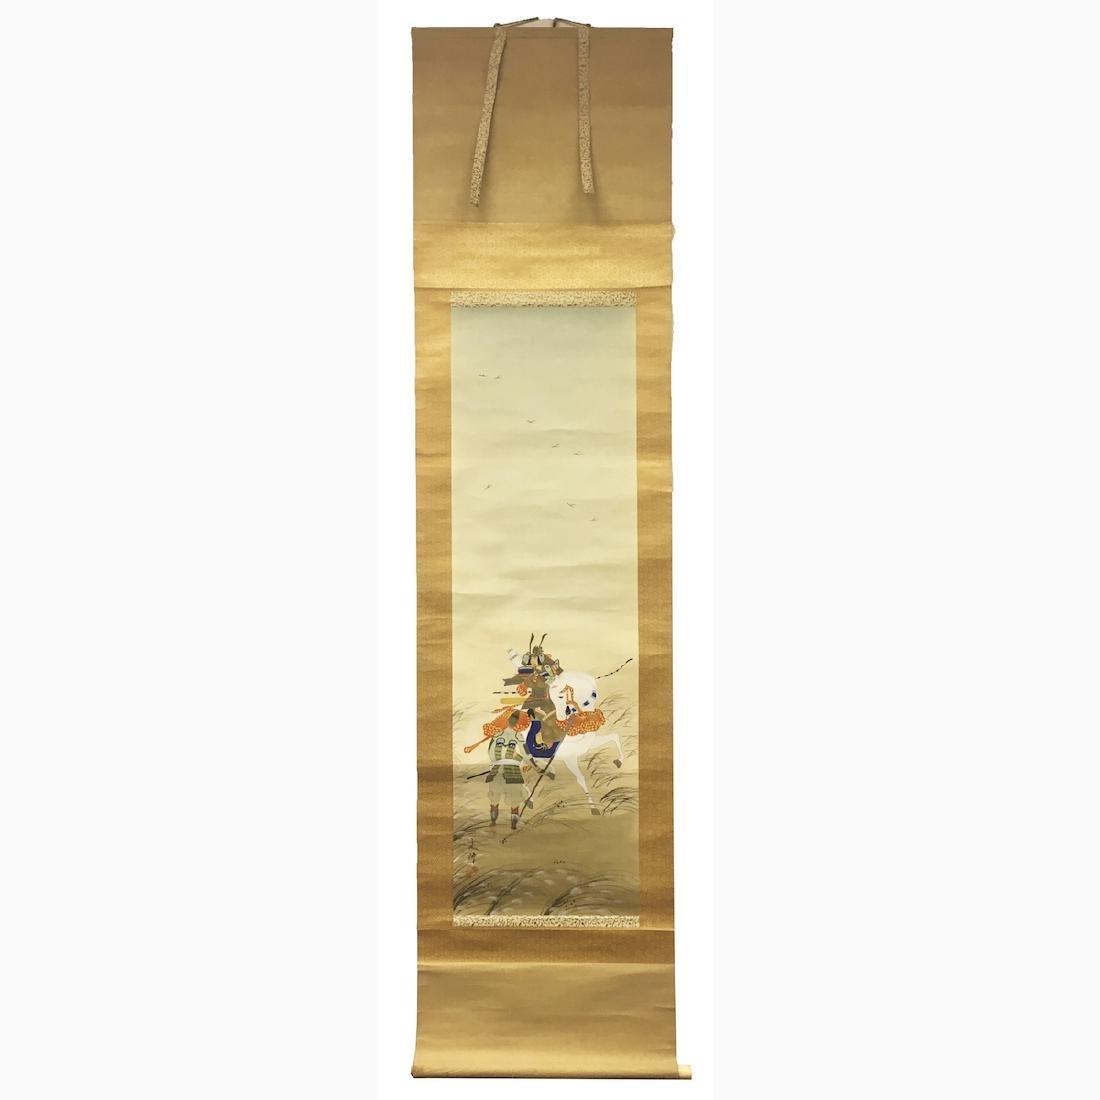 Japanese Scroll of Two Samurai